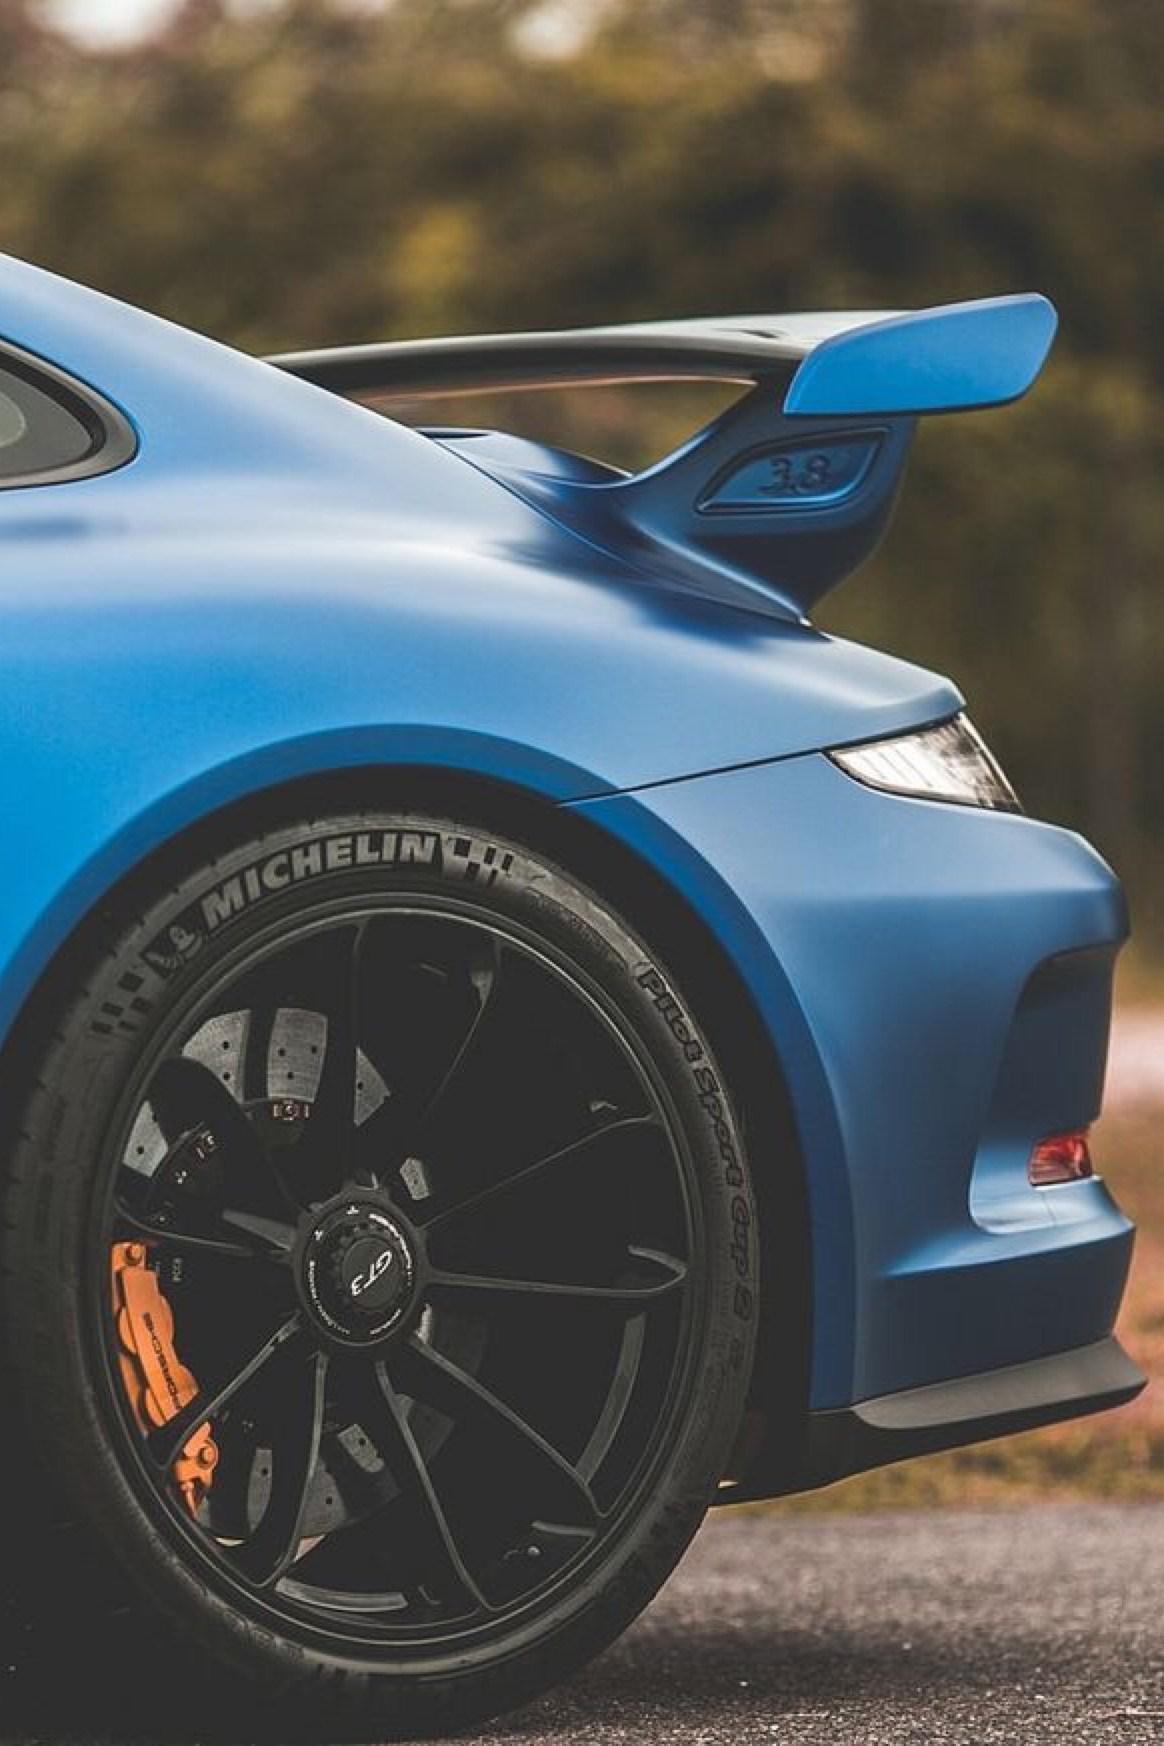 porsche blue 911 wheel sportscar fast drive daylight race hurry action